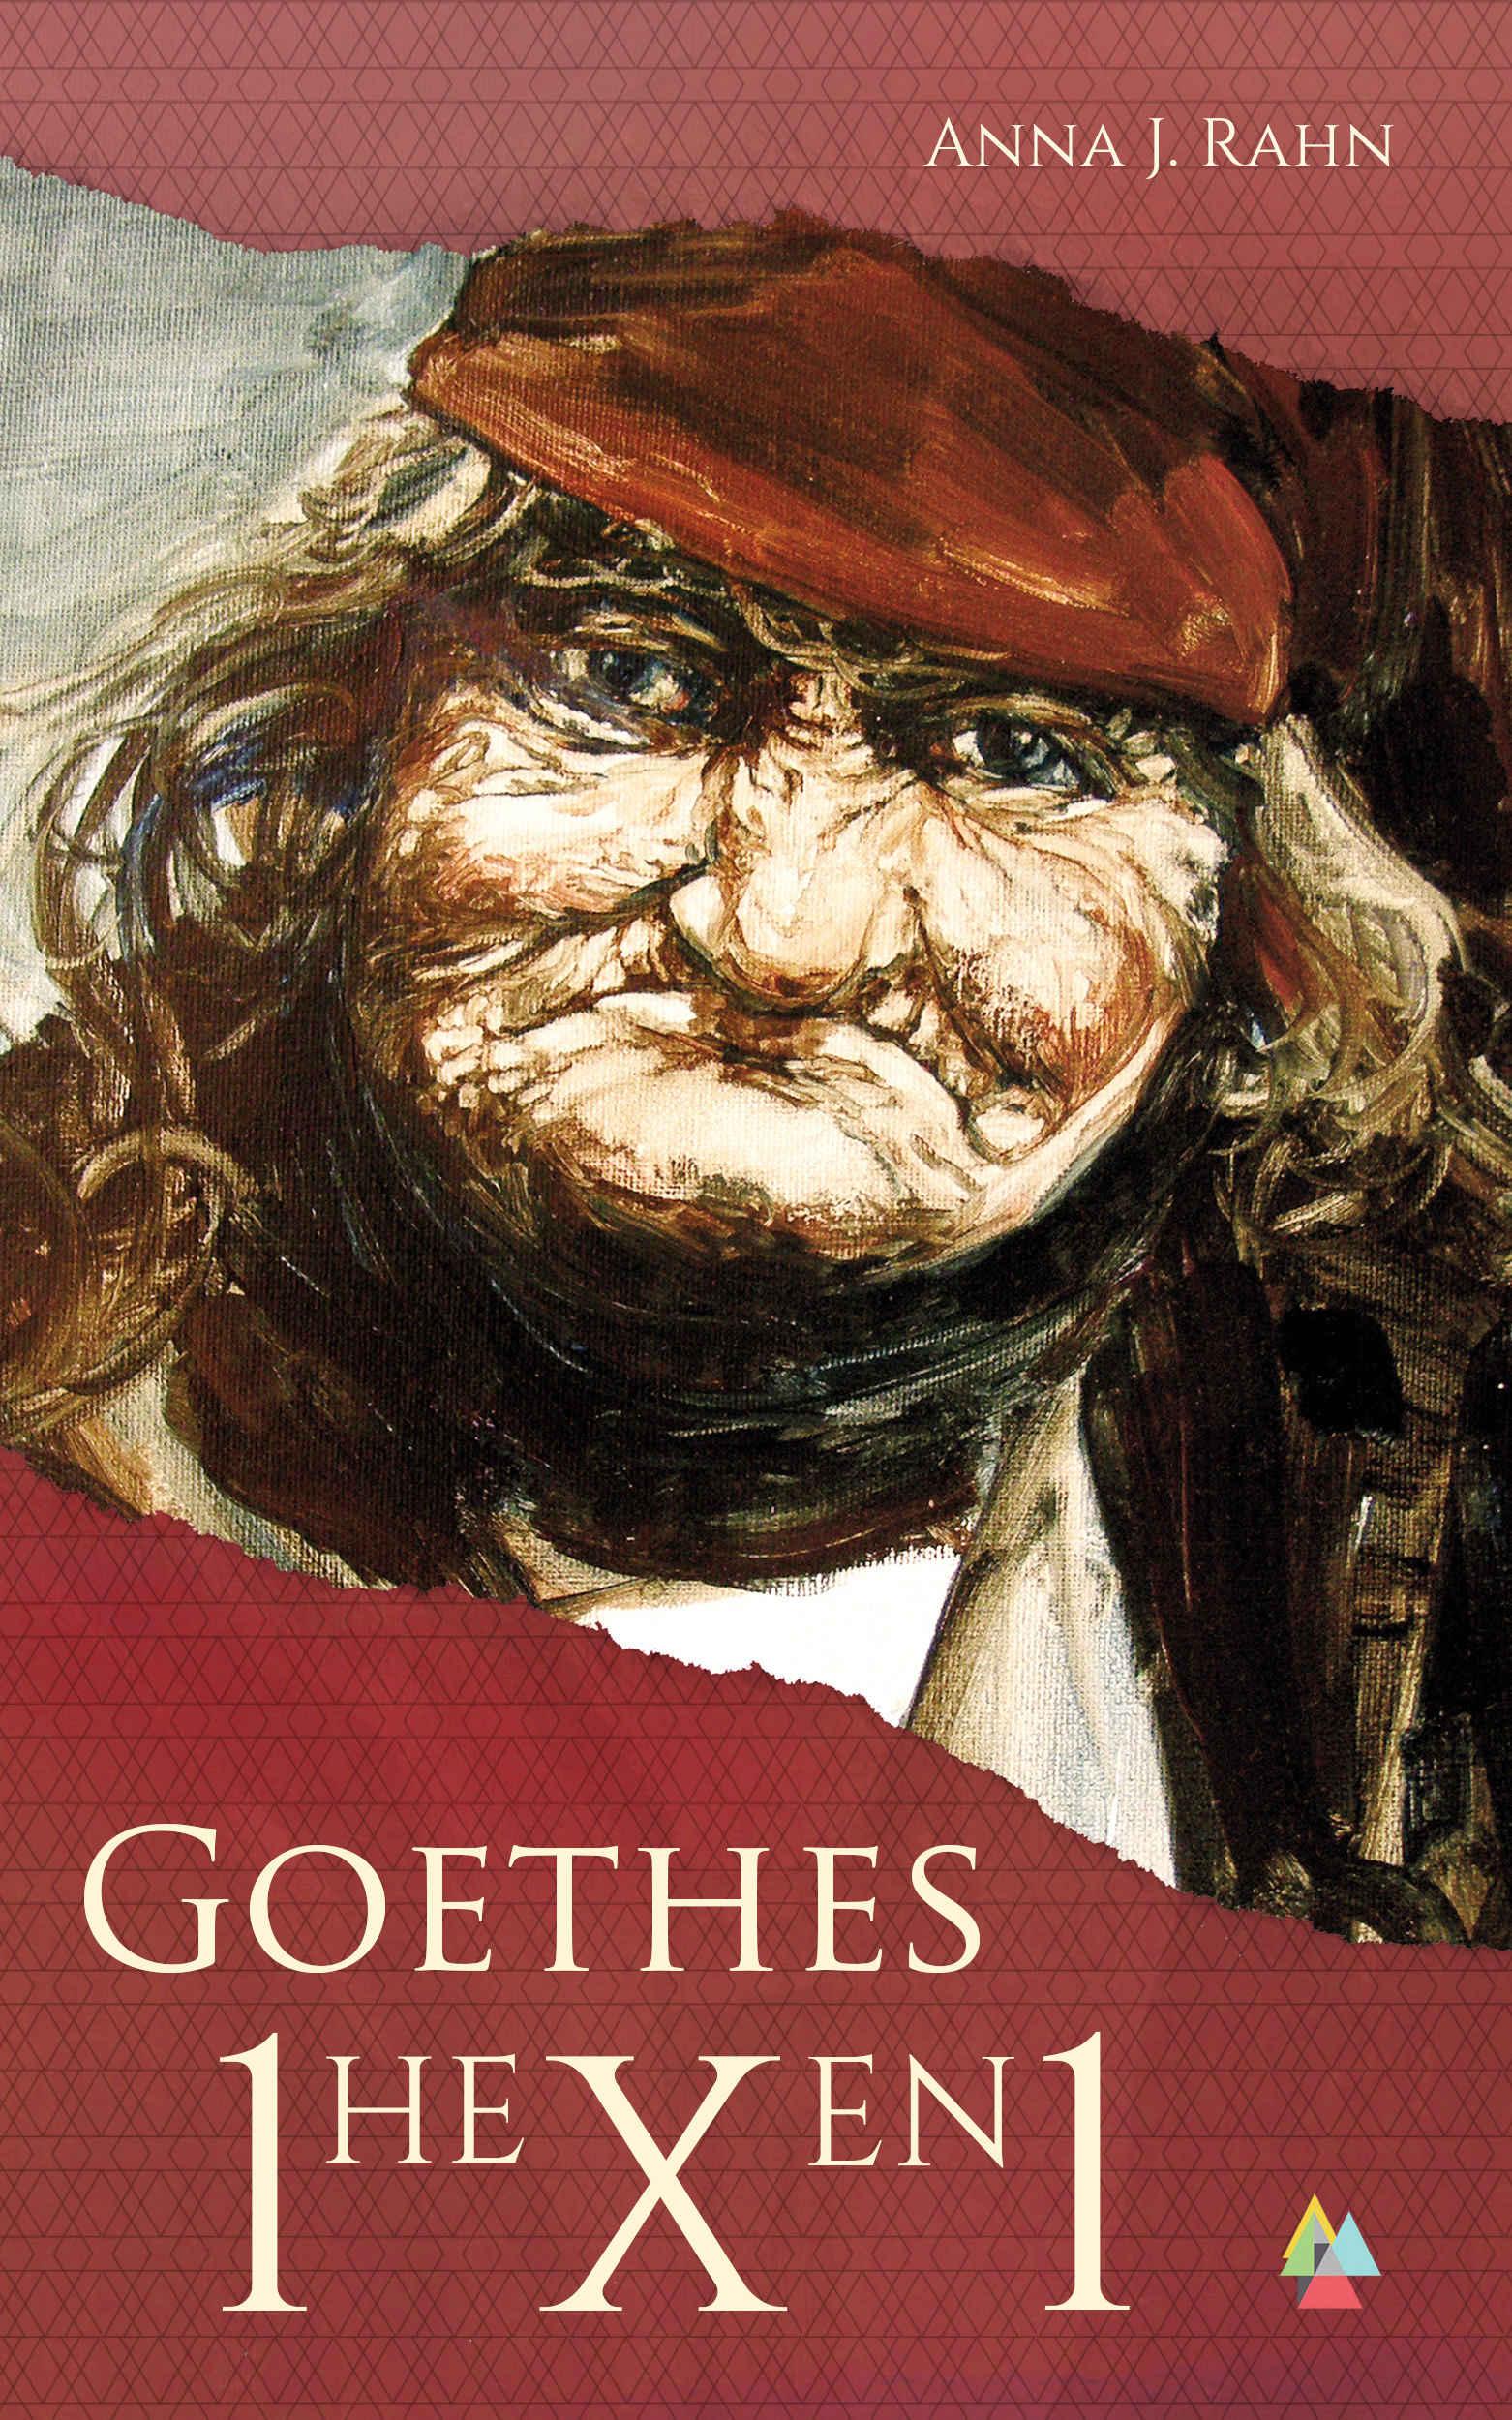 Anna J. Rahn Goethes Hexeneinmaleins Goethe Hexen1x1 Faust Auflösung Lösung Erklärung Hexe Meerkatzen Philosophie Mystik Kabbala Christentum Weltbild